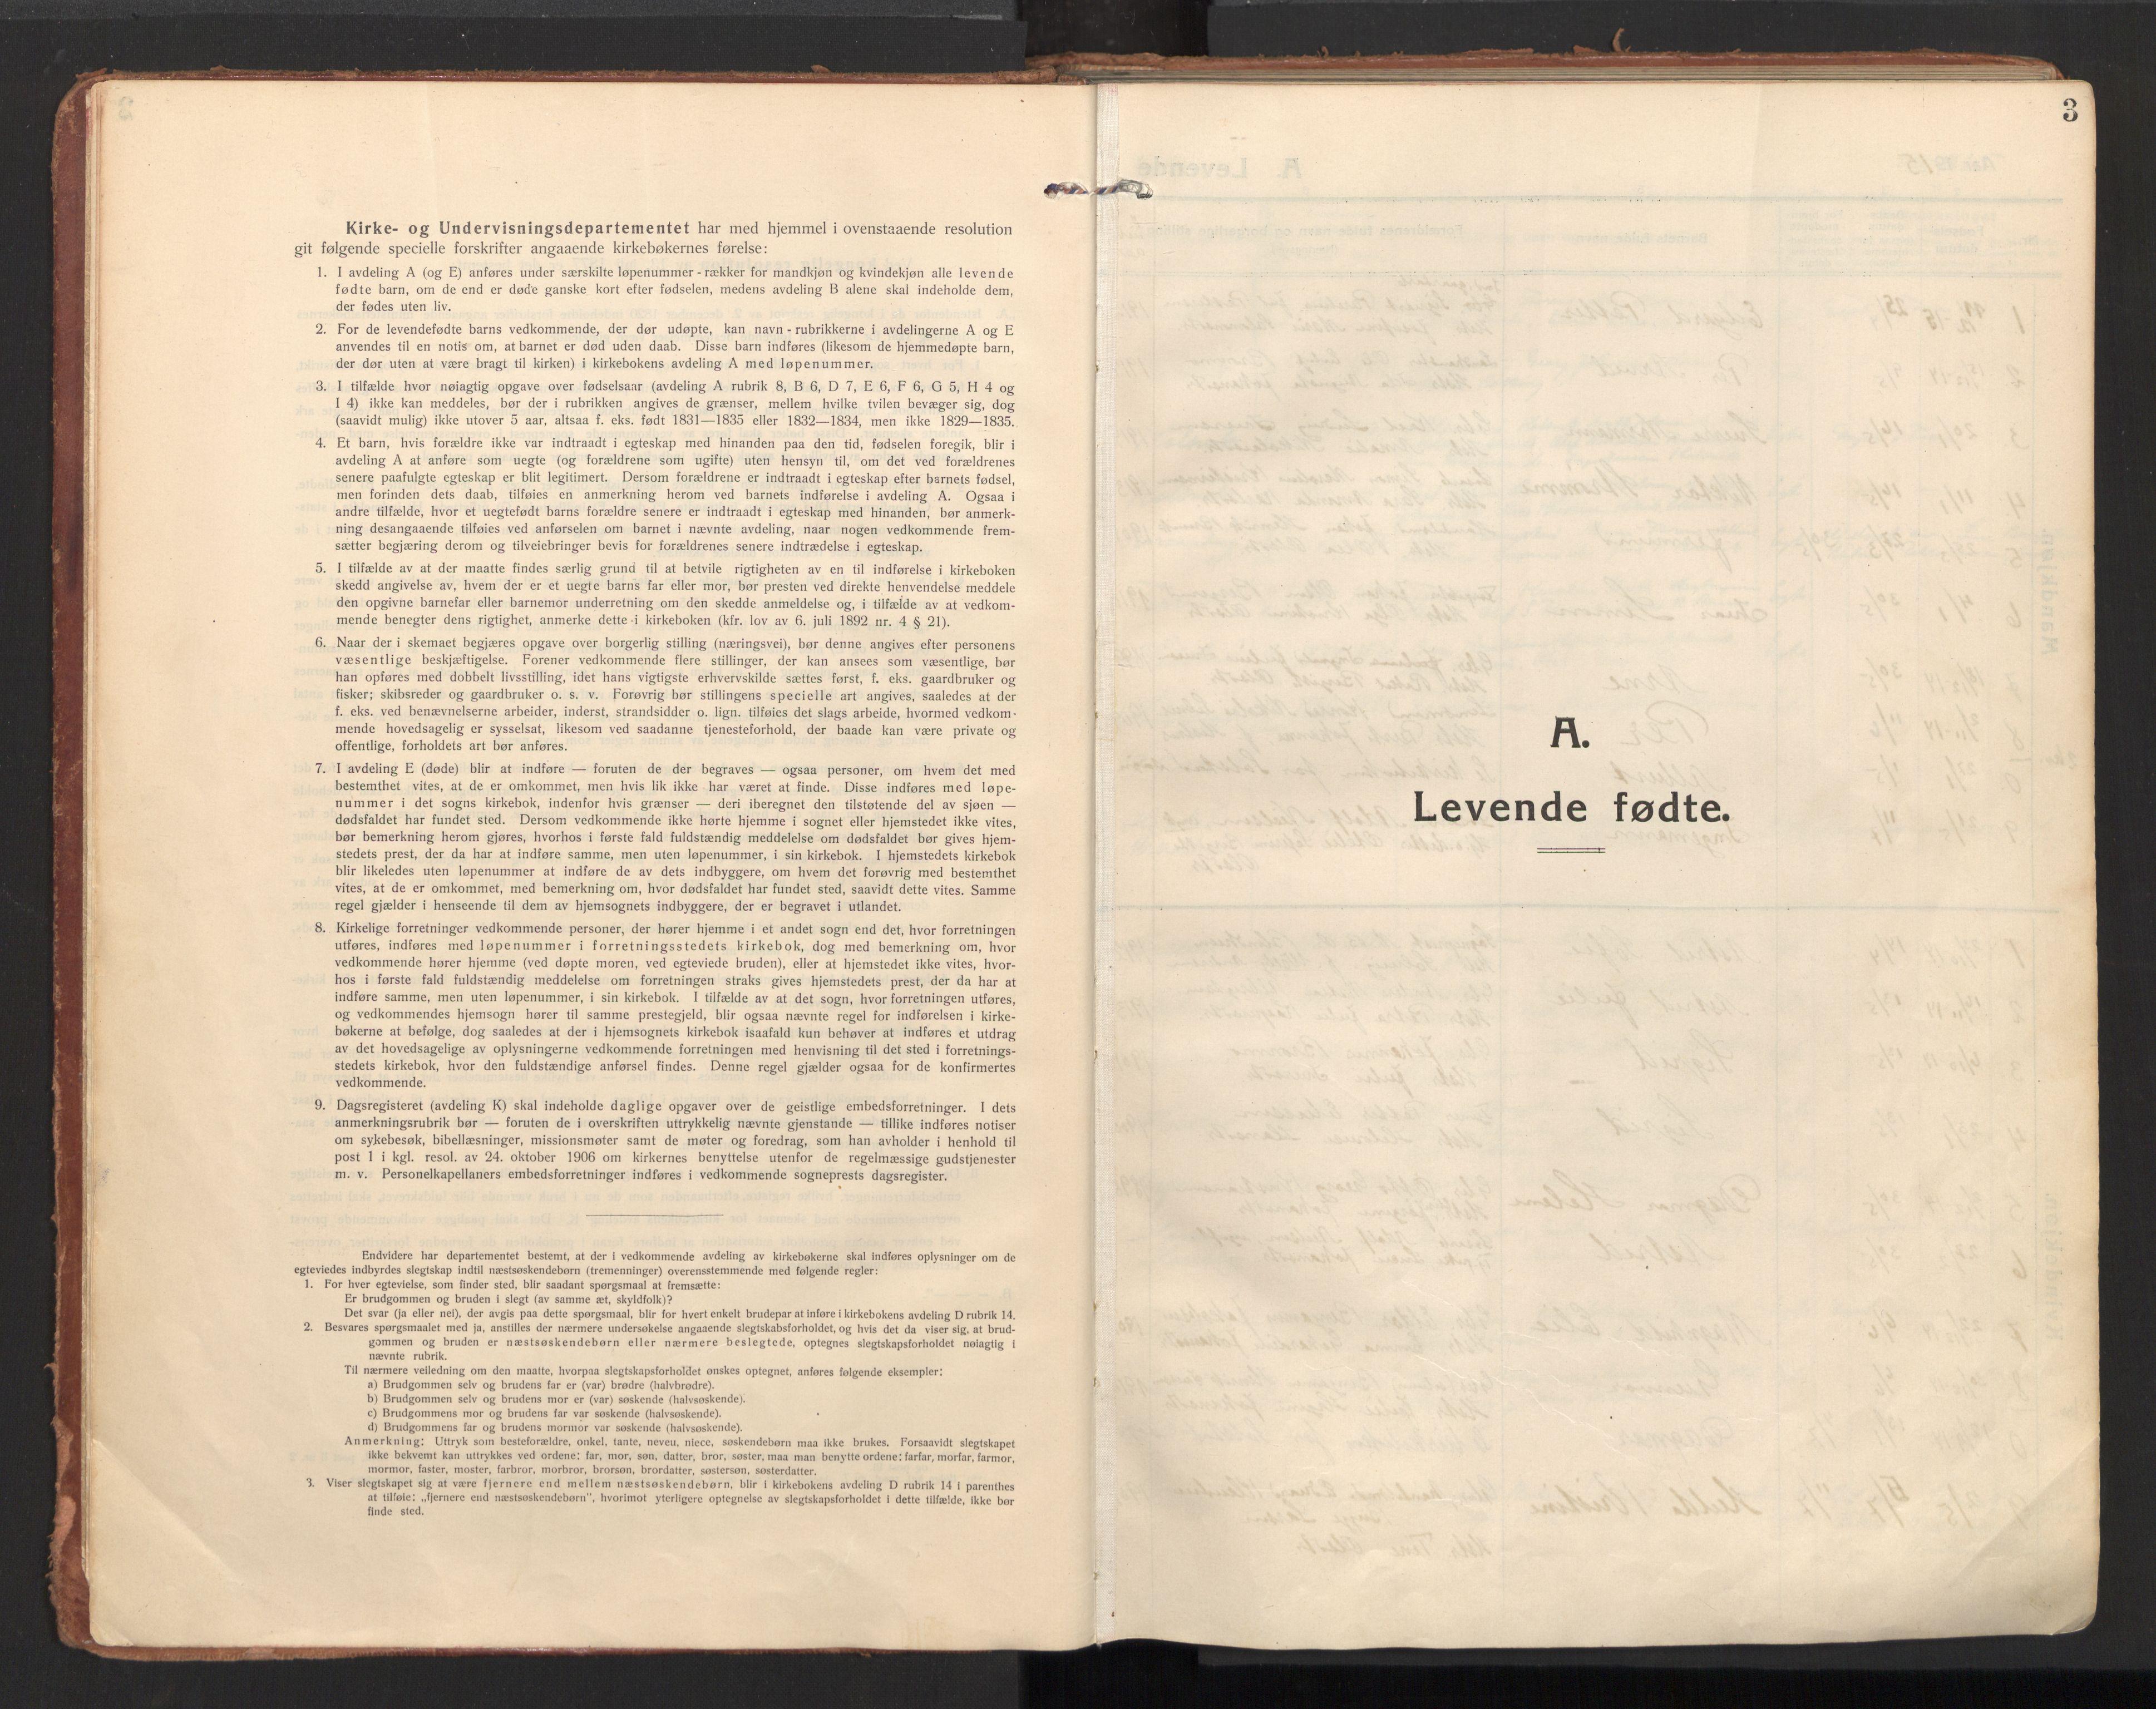 SAT, Ministerialprotokoller, klokkerbøker og fødselsregistre - Nordland, 810/L0156: Ministerialbok nr. 810A15, 1915-1930, s. 3